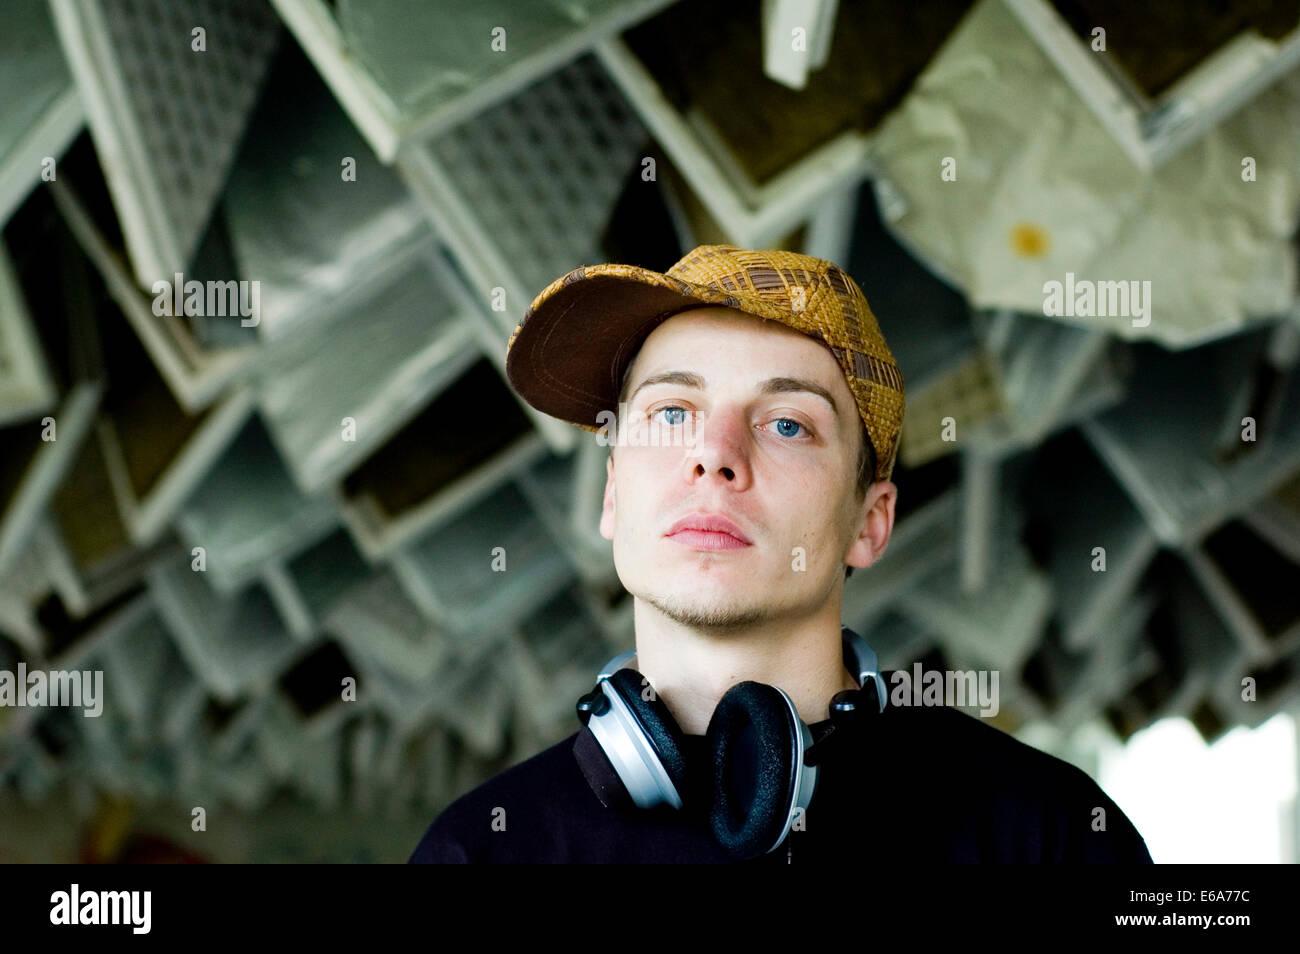 Jugendliche, Musik hören, Jugendkultur Stockbild